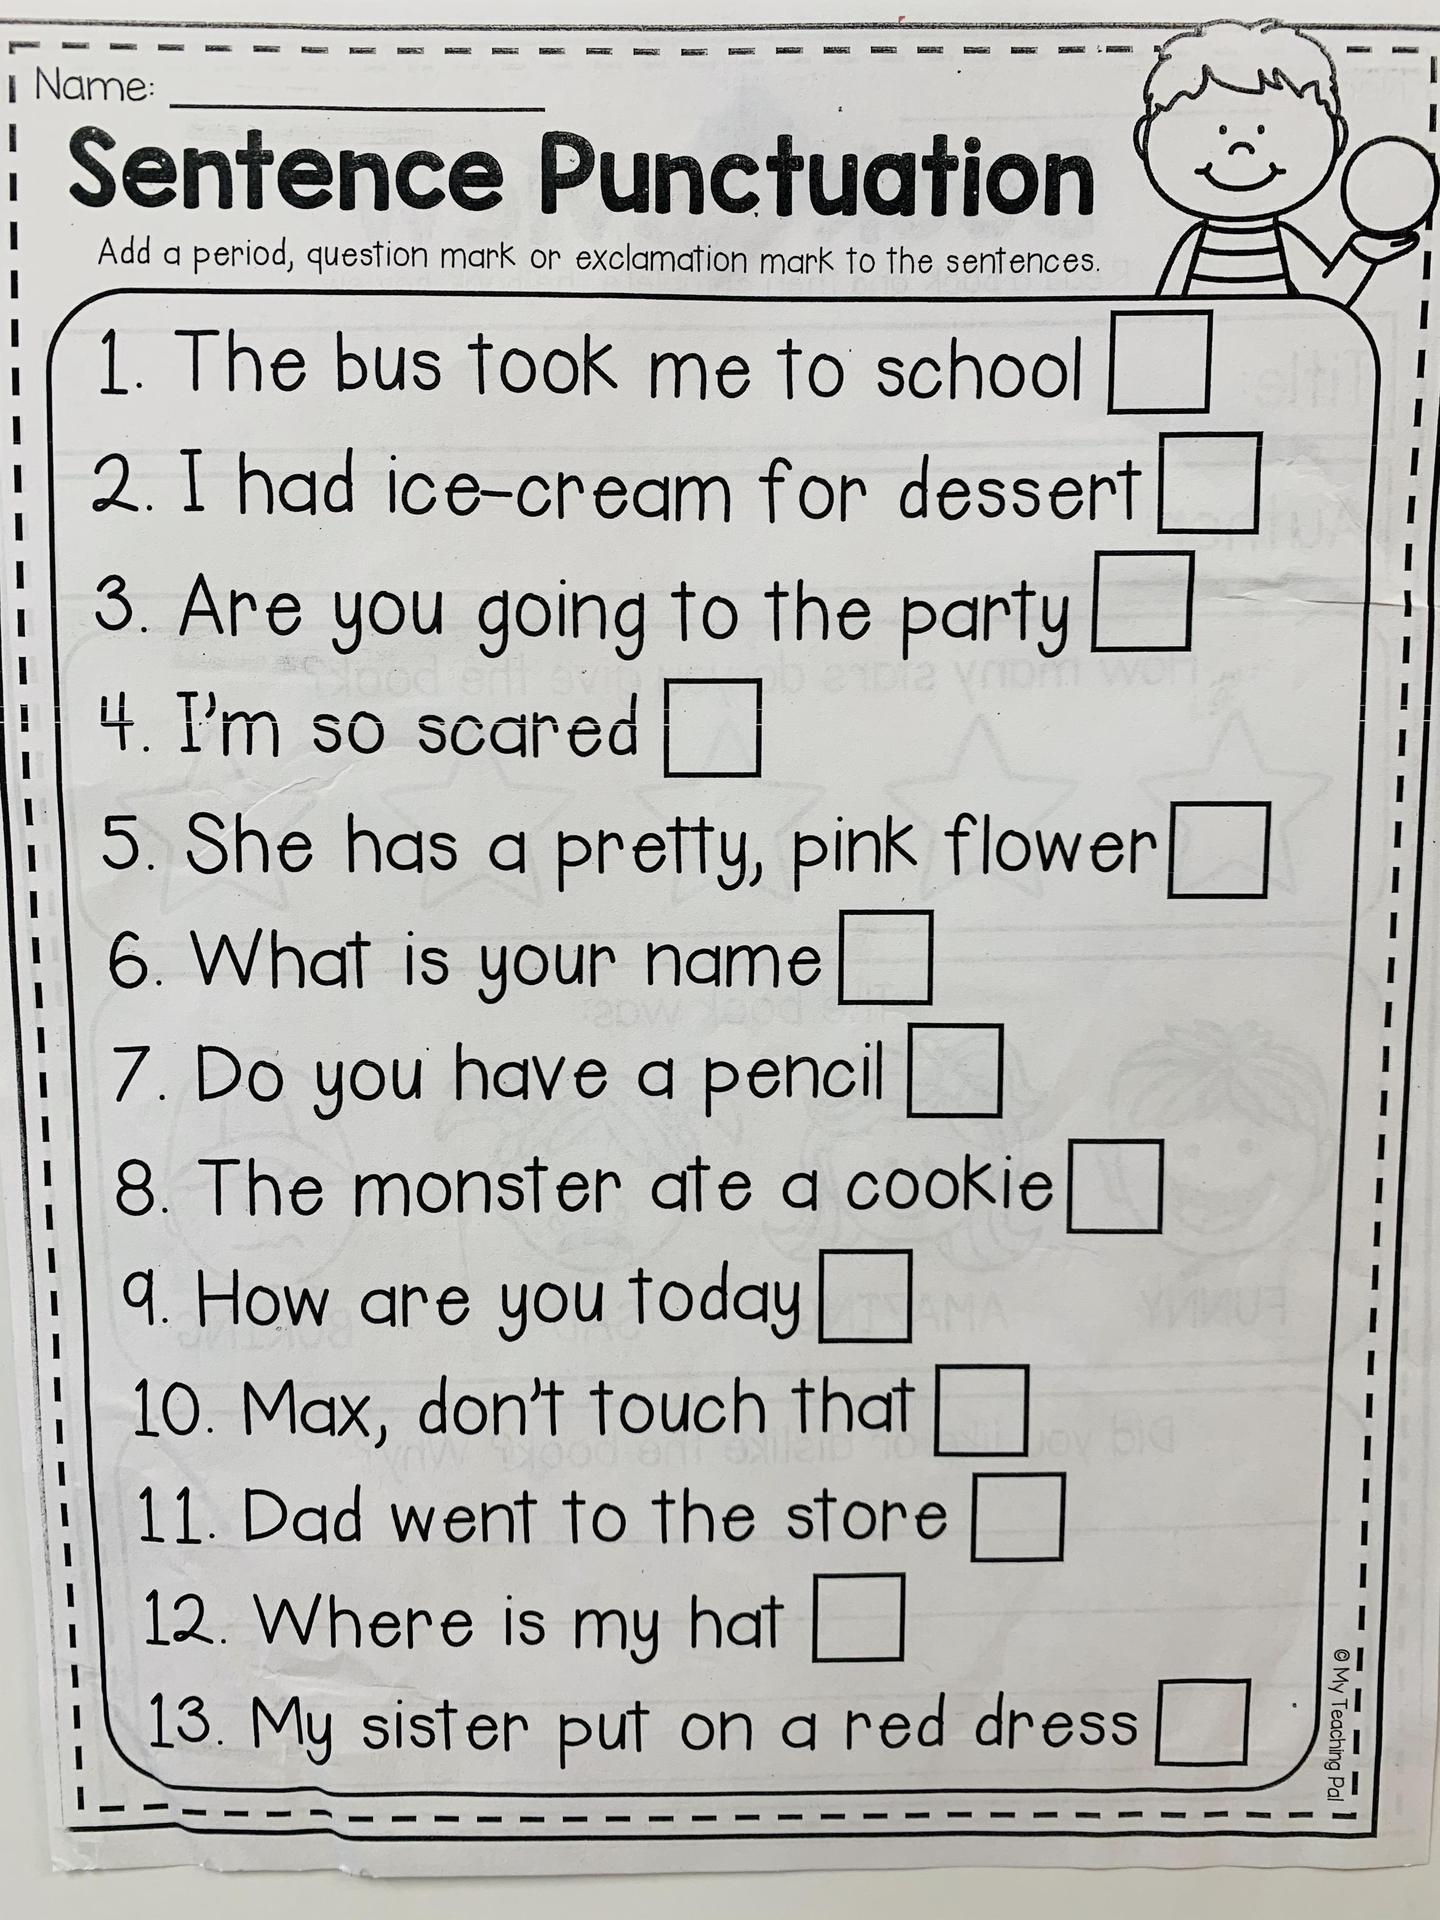 sentence punctuation